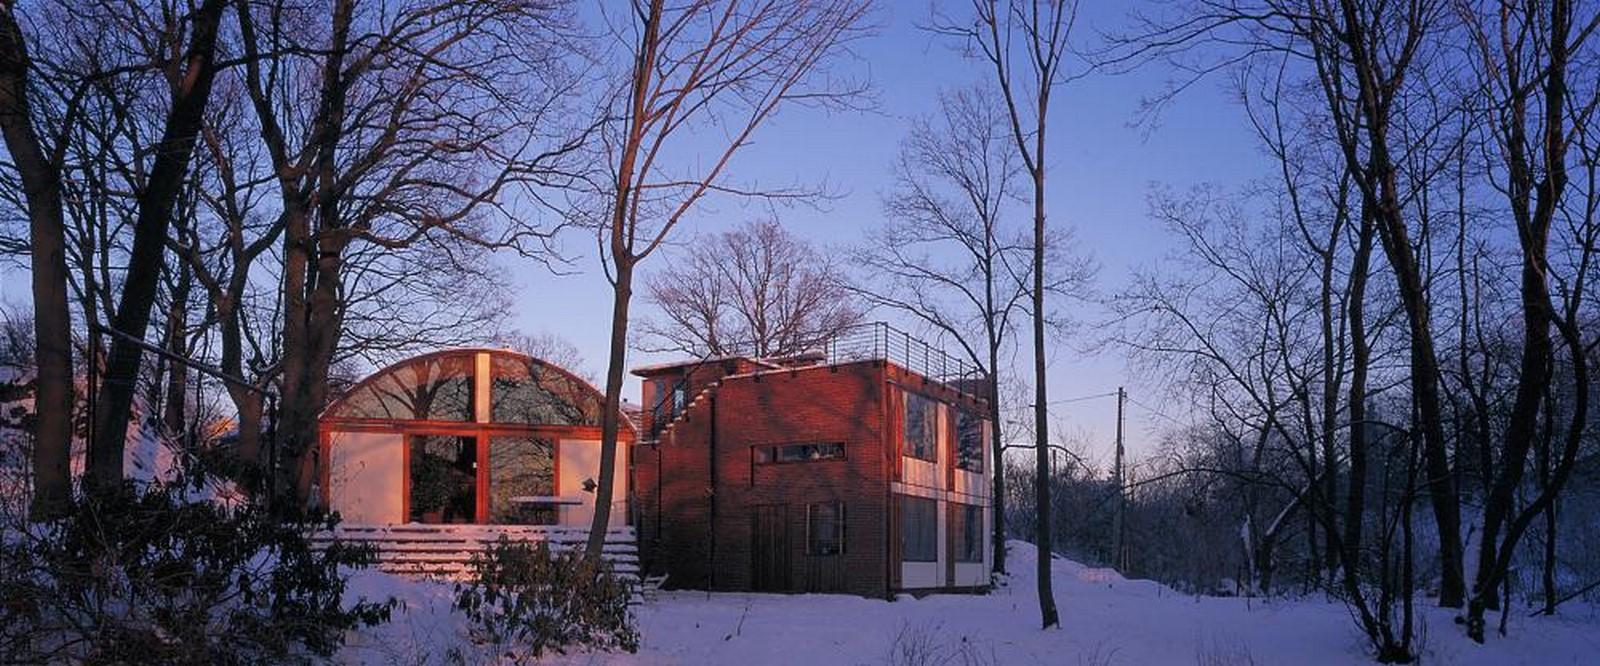 Villa Wormdal Haug - Sheet2